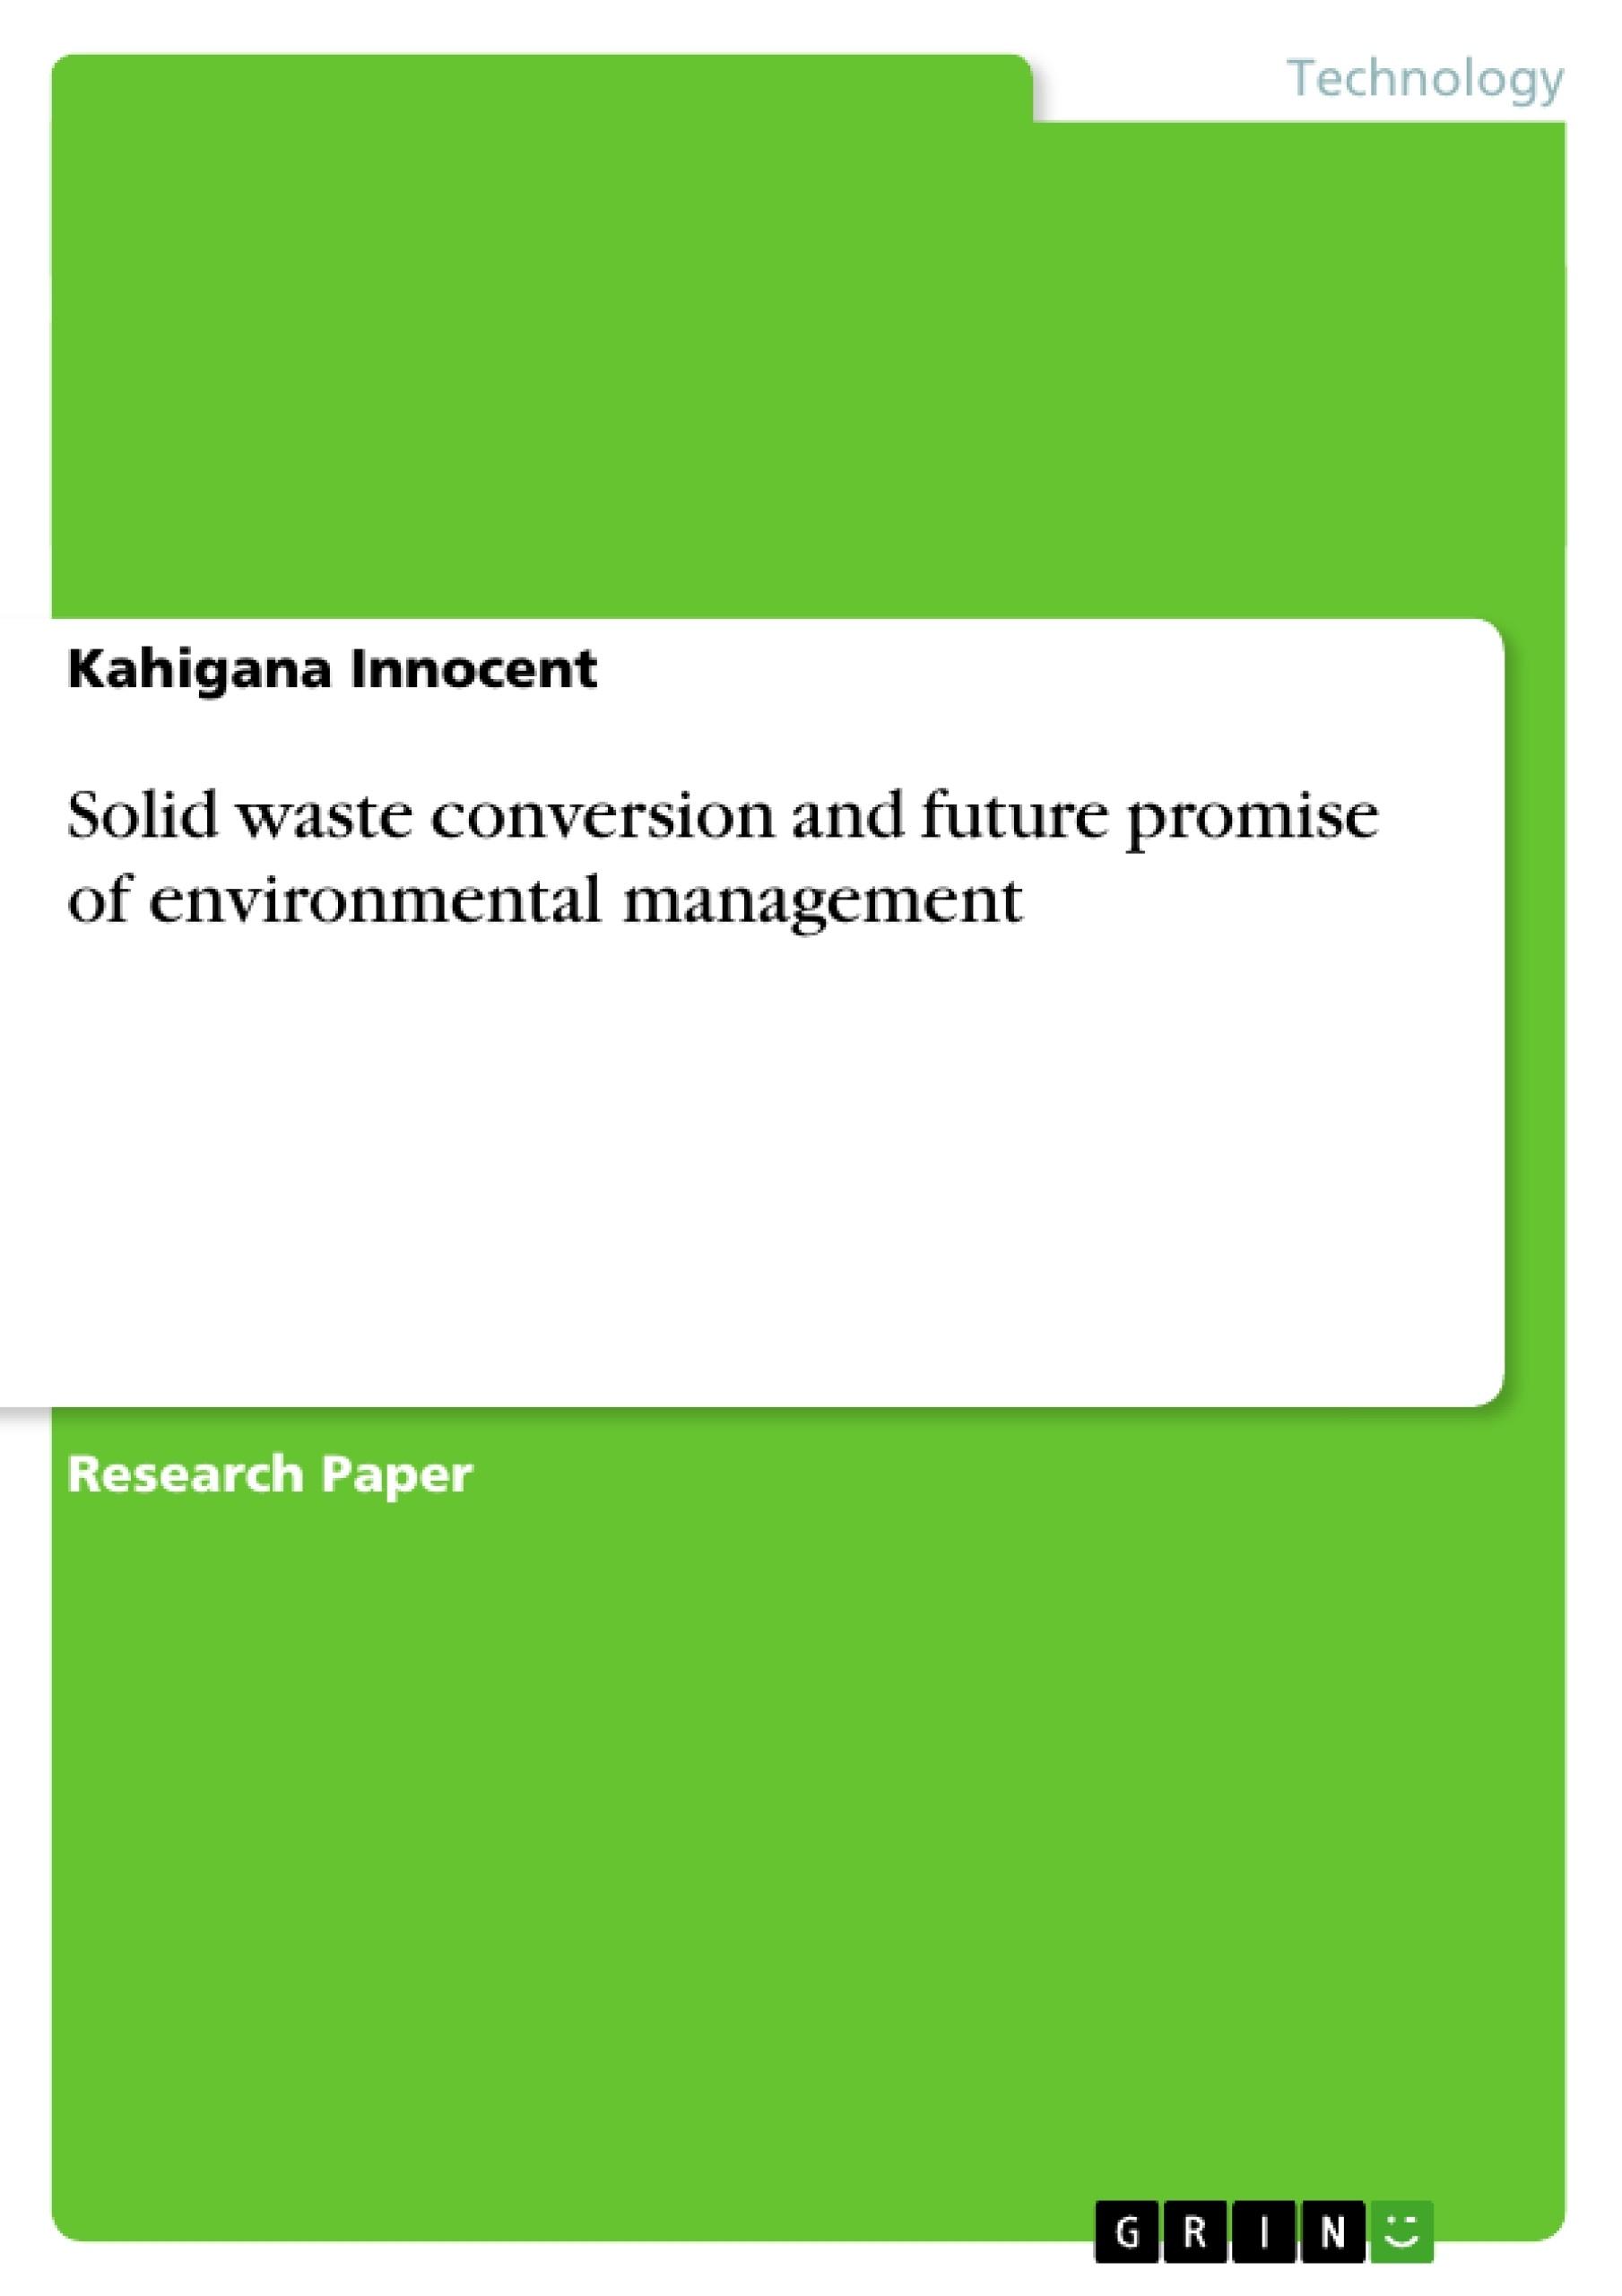 thesis on environmental management accounting Theses 1995 strategy, perceived environmental uncertainty, management  accounting systems and performance: an empirical investigation kar ming  chong.